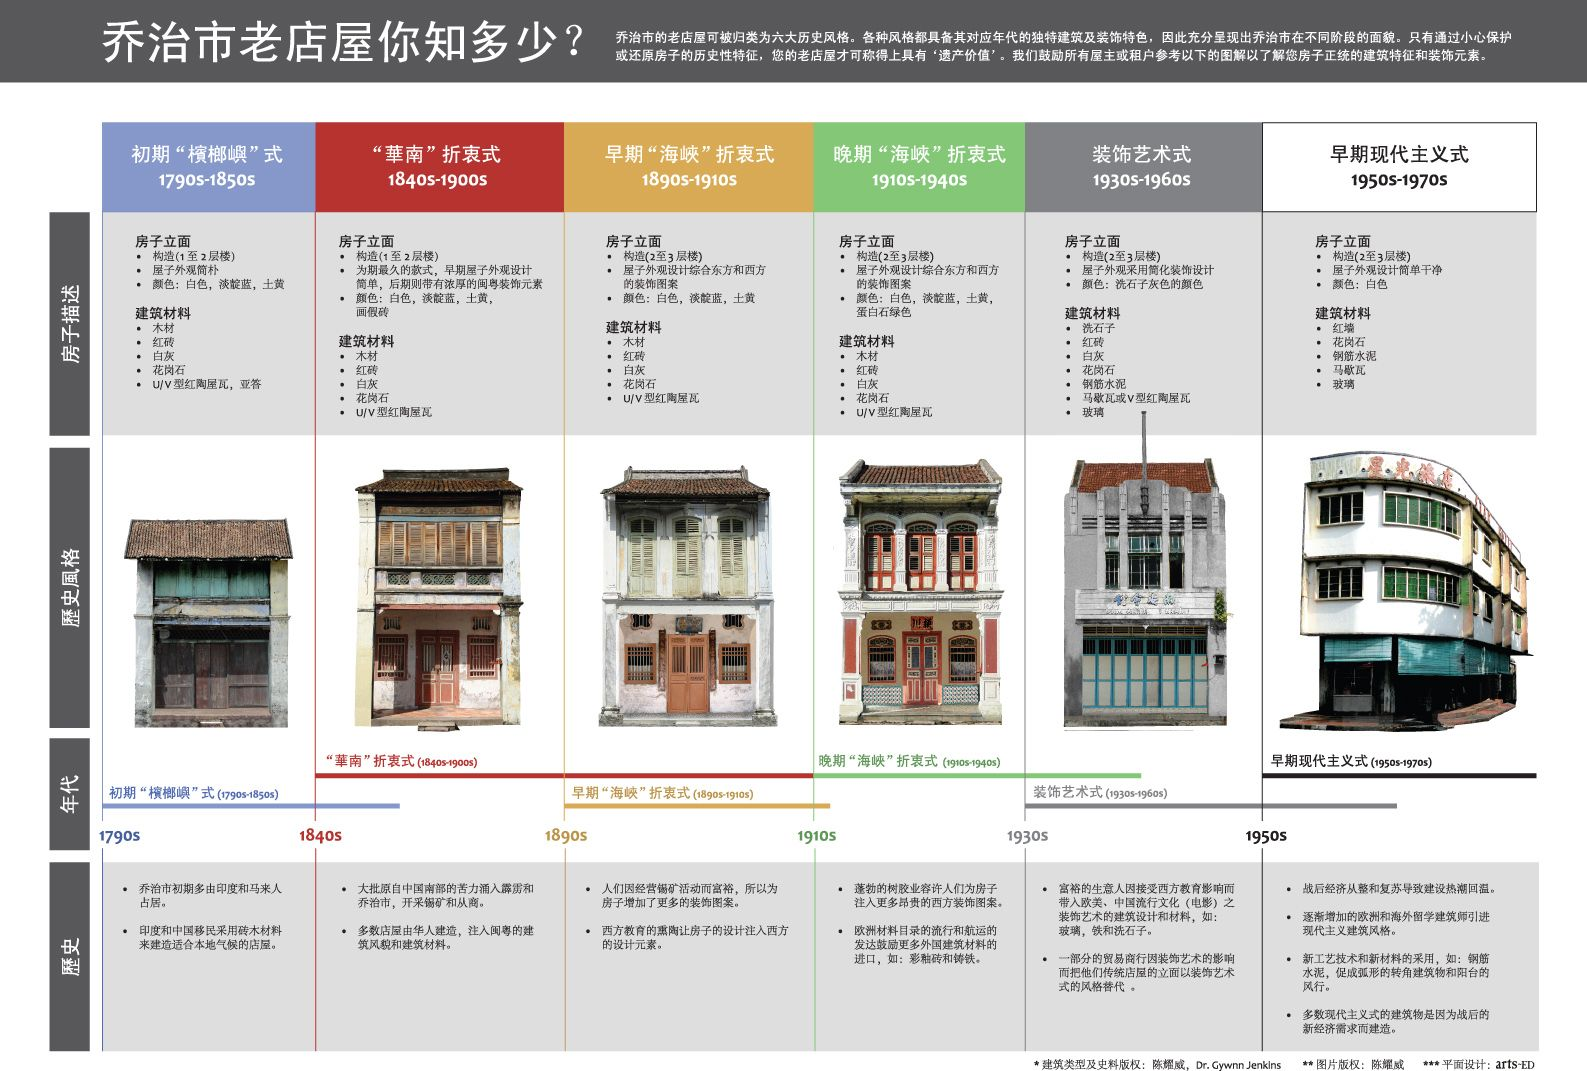 Penang+Heritage+Shophouse+Visual+Guide_chinese.jpg (1587×1071 ...